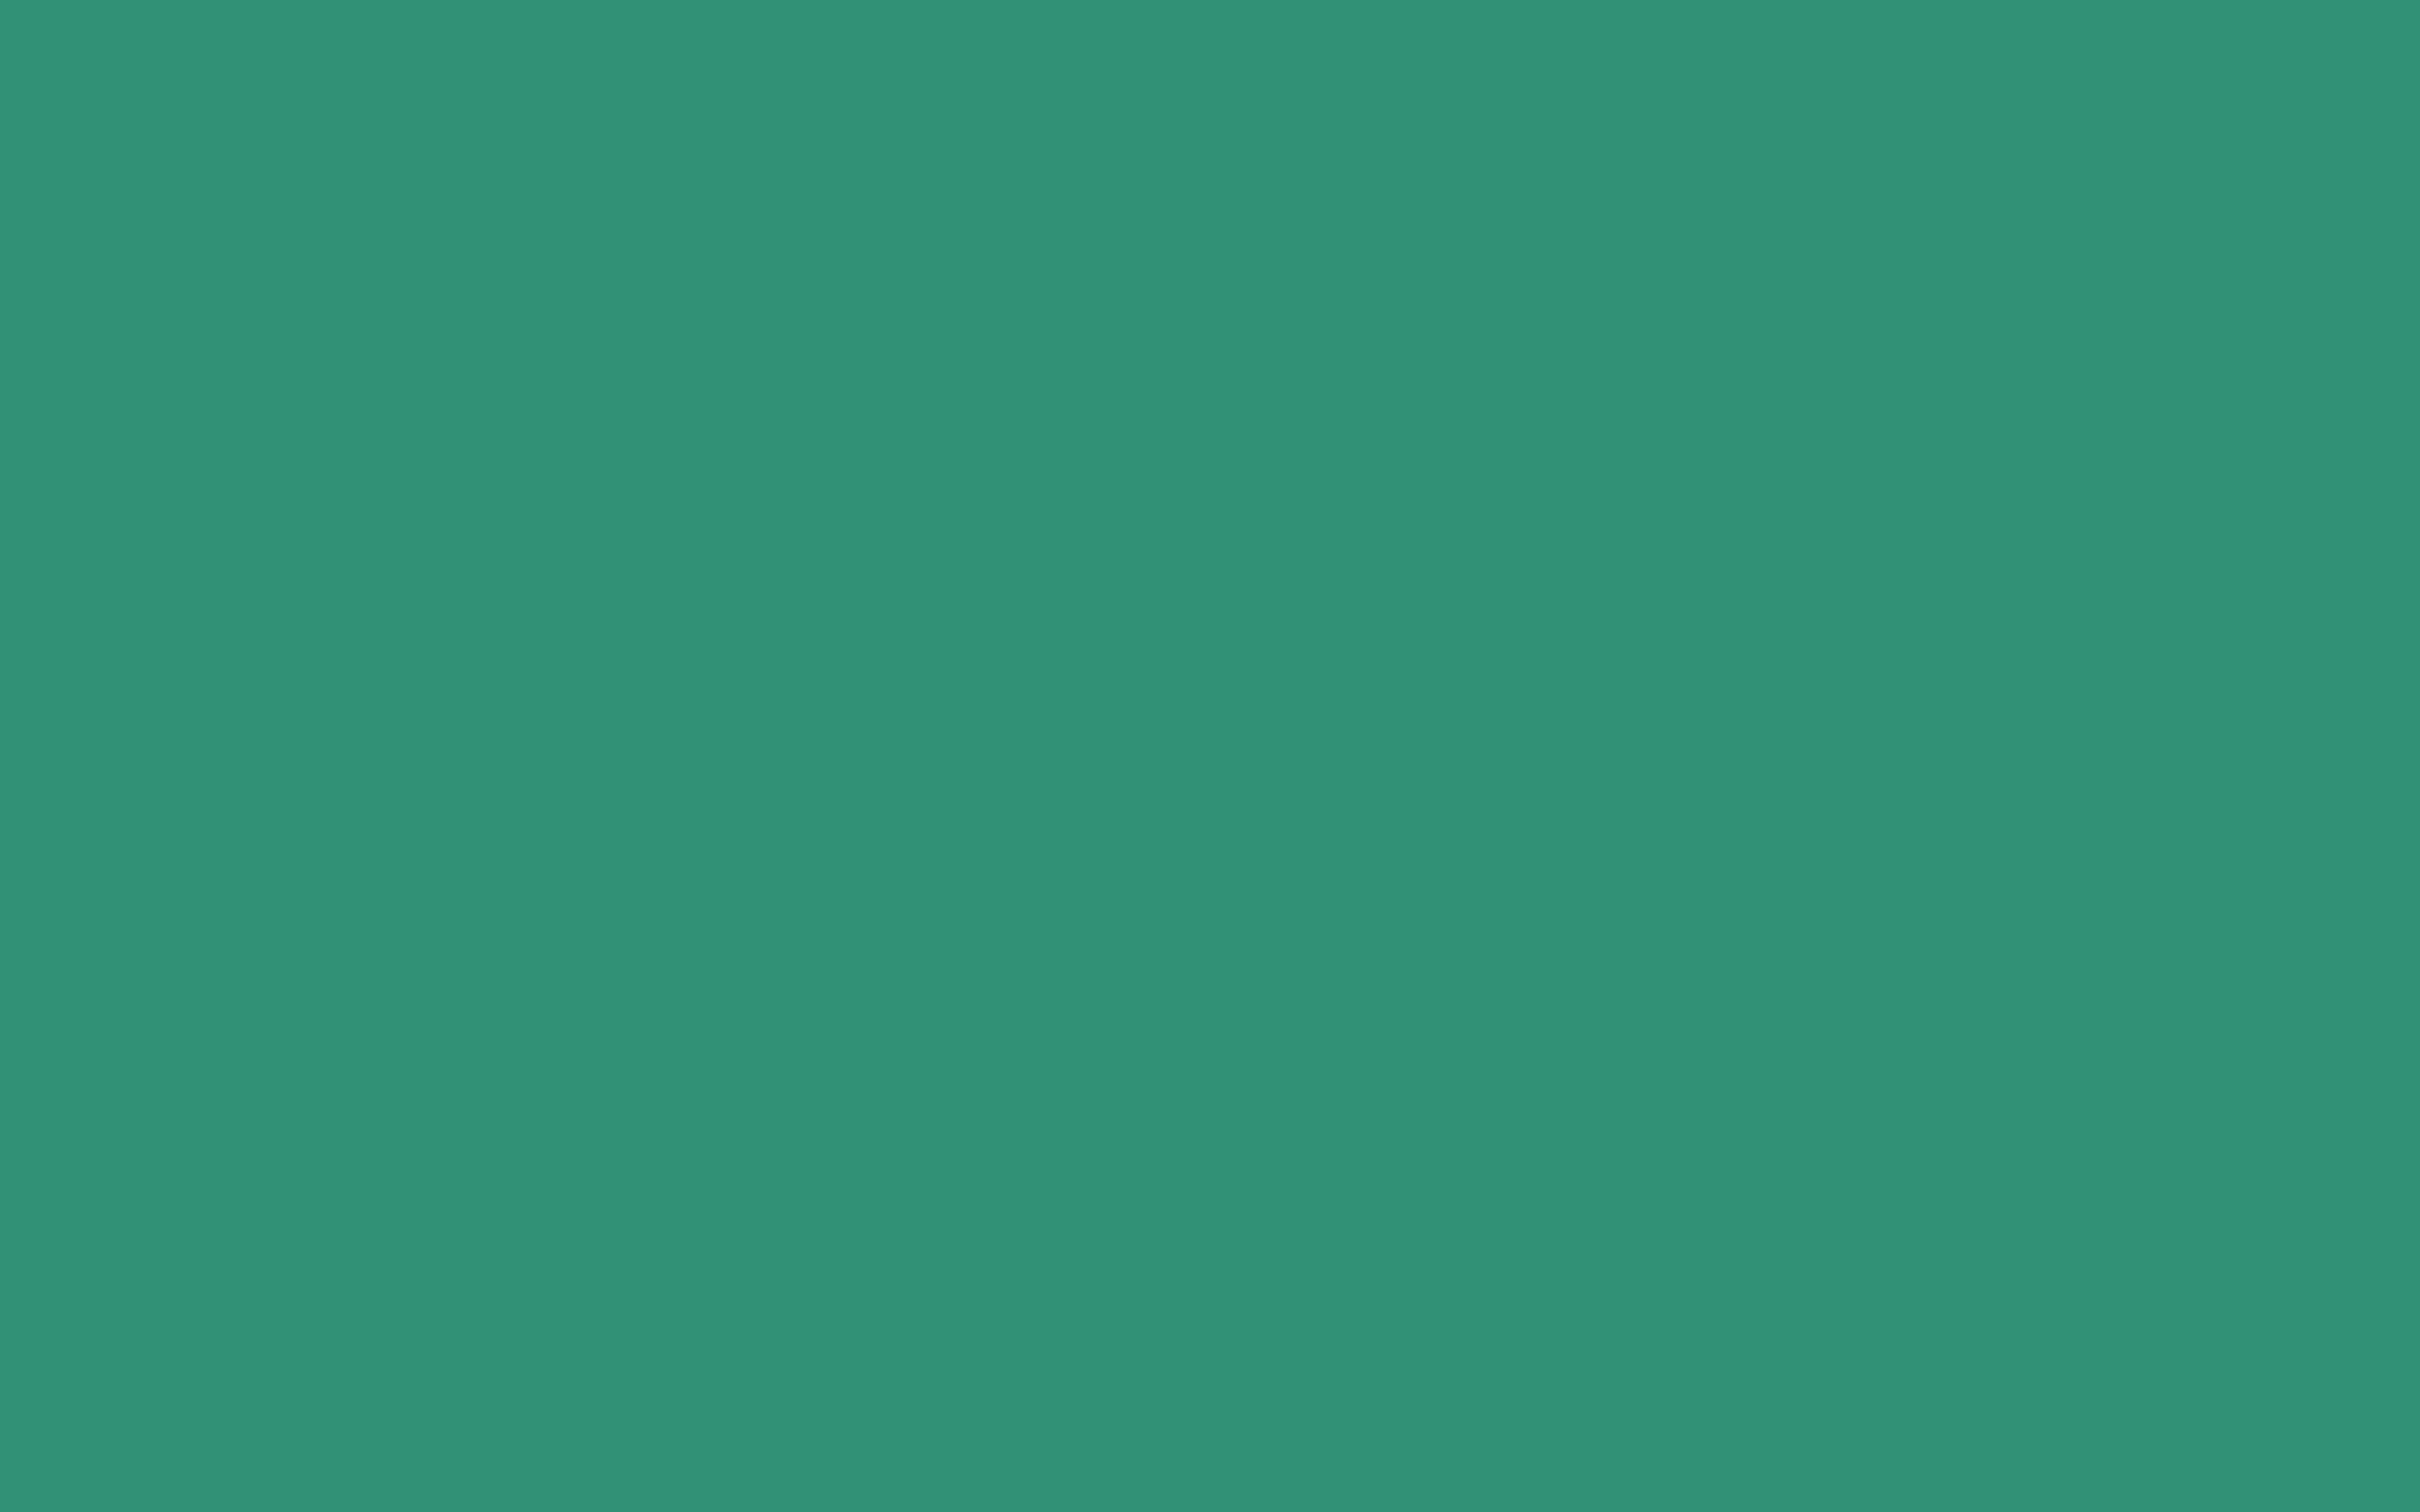 2560x1600 Illuminating Emerald Solid Color Background